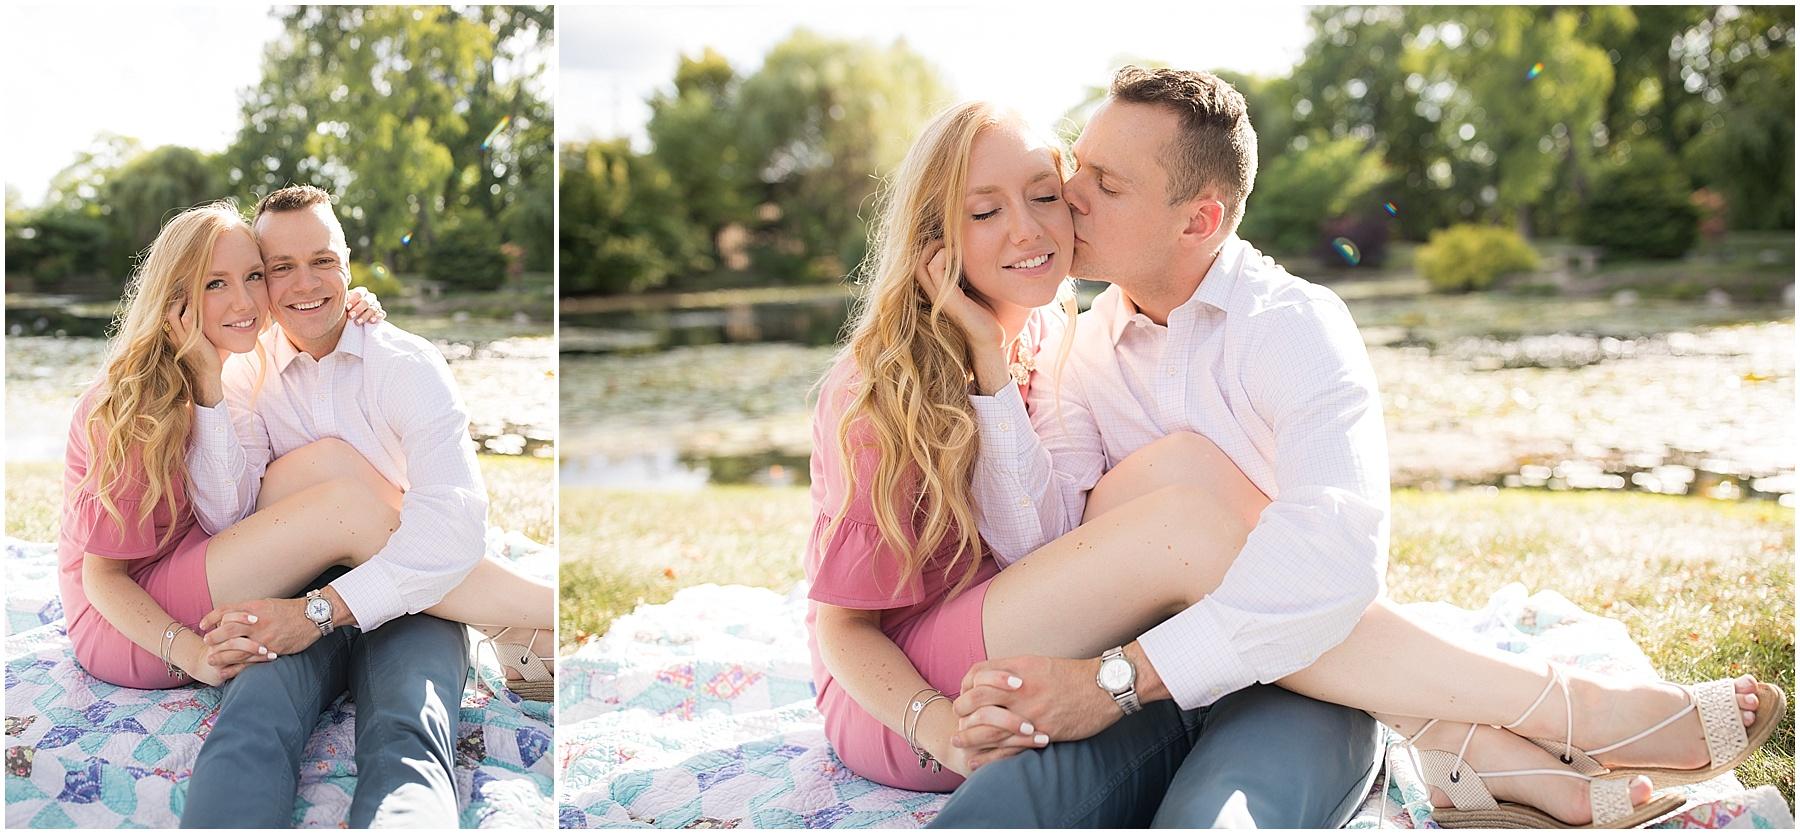 Spouse kissing his bride to be cheeks. Indianapolis Engagement Photographer, Raindancer Studios